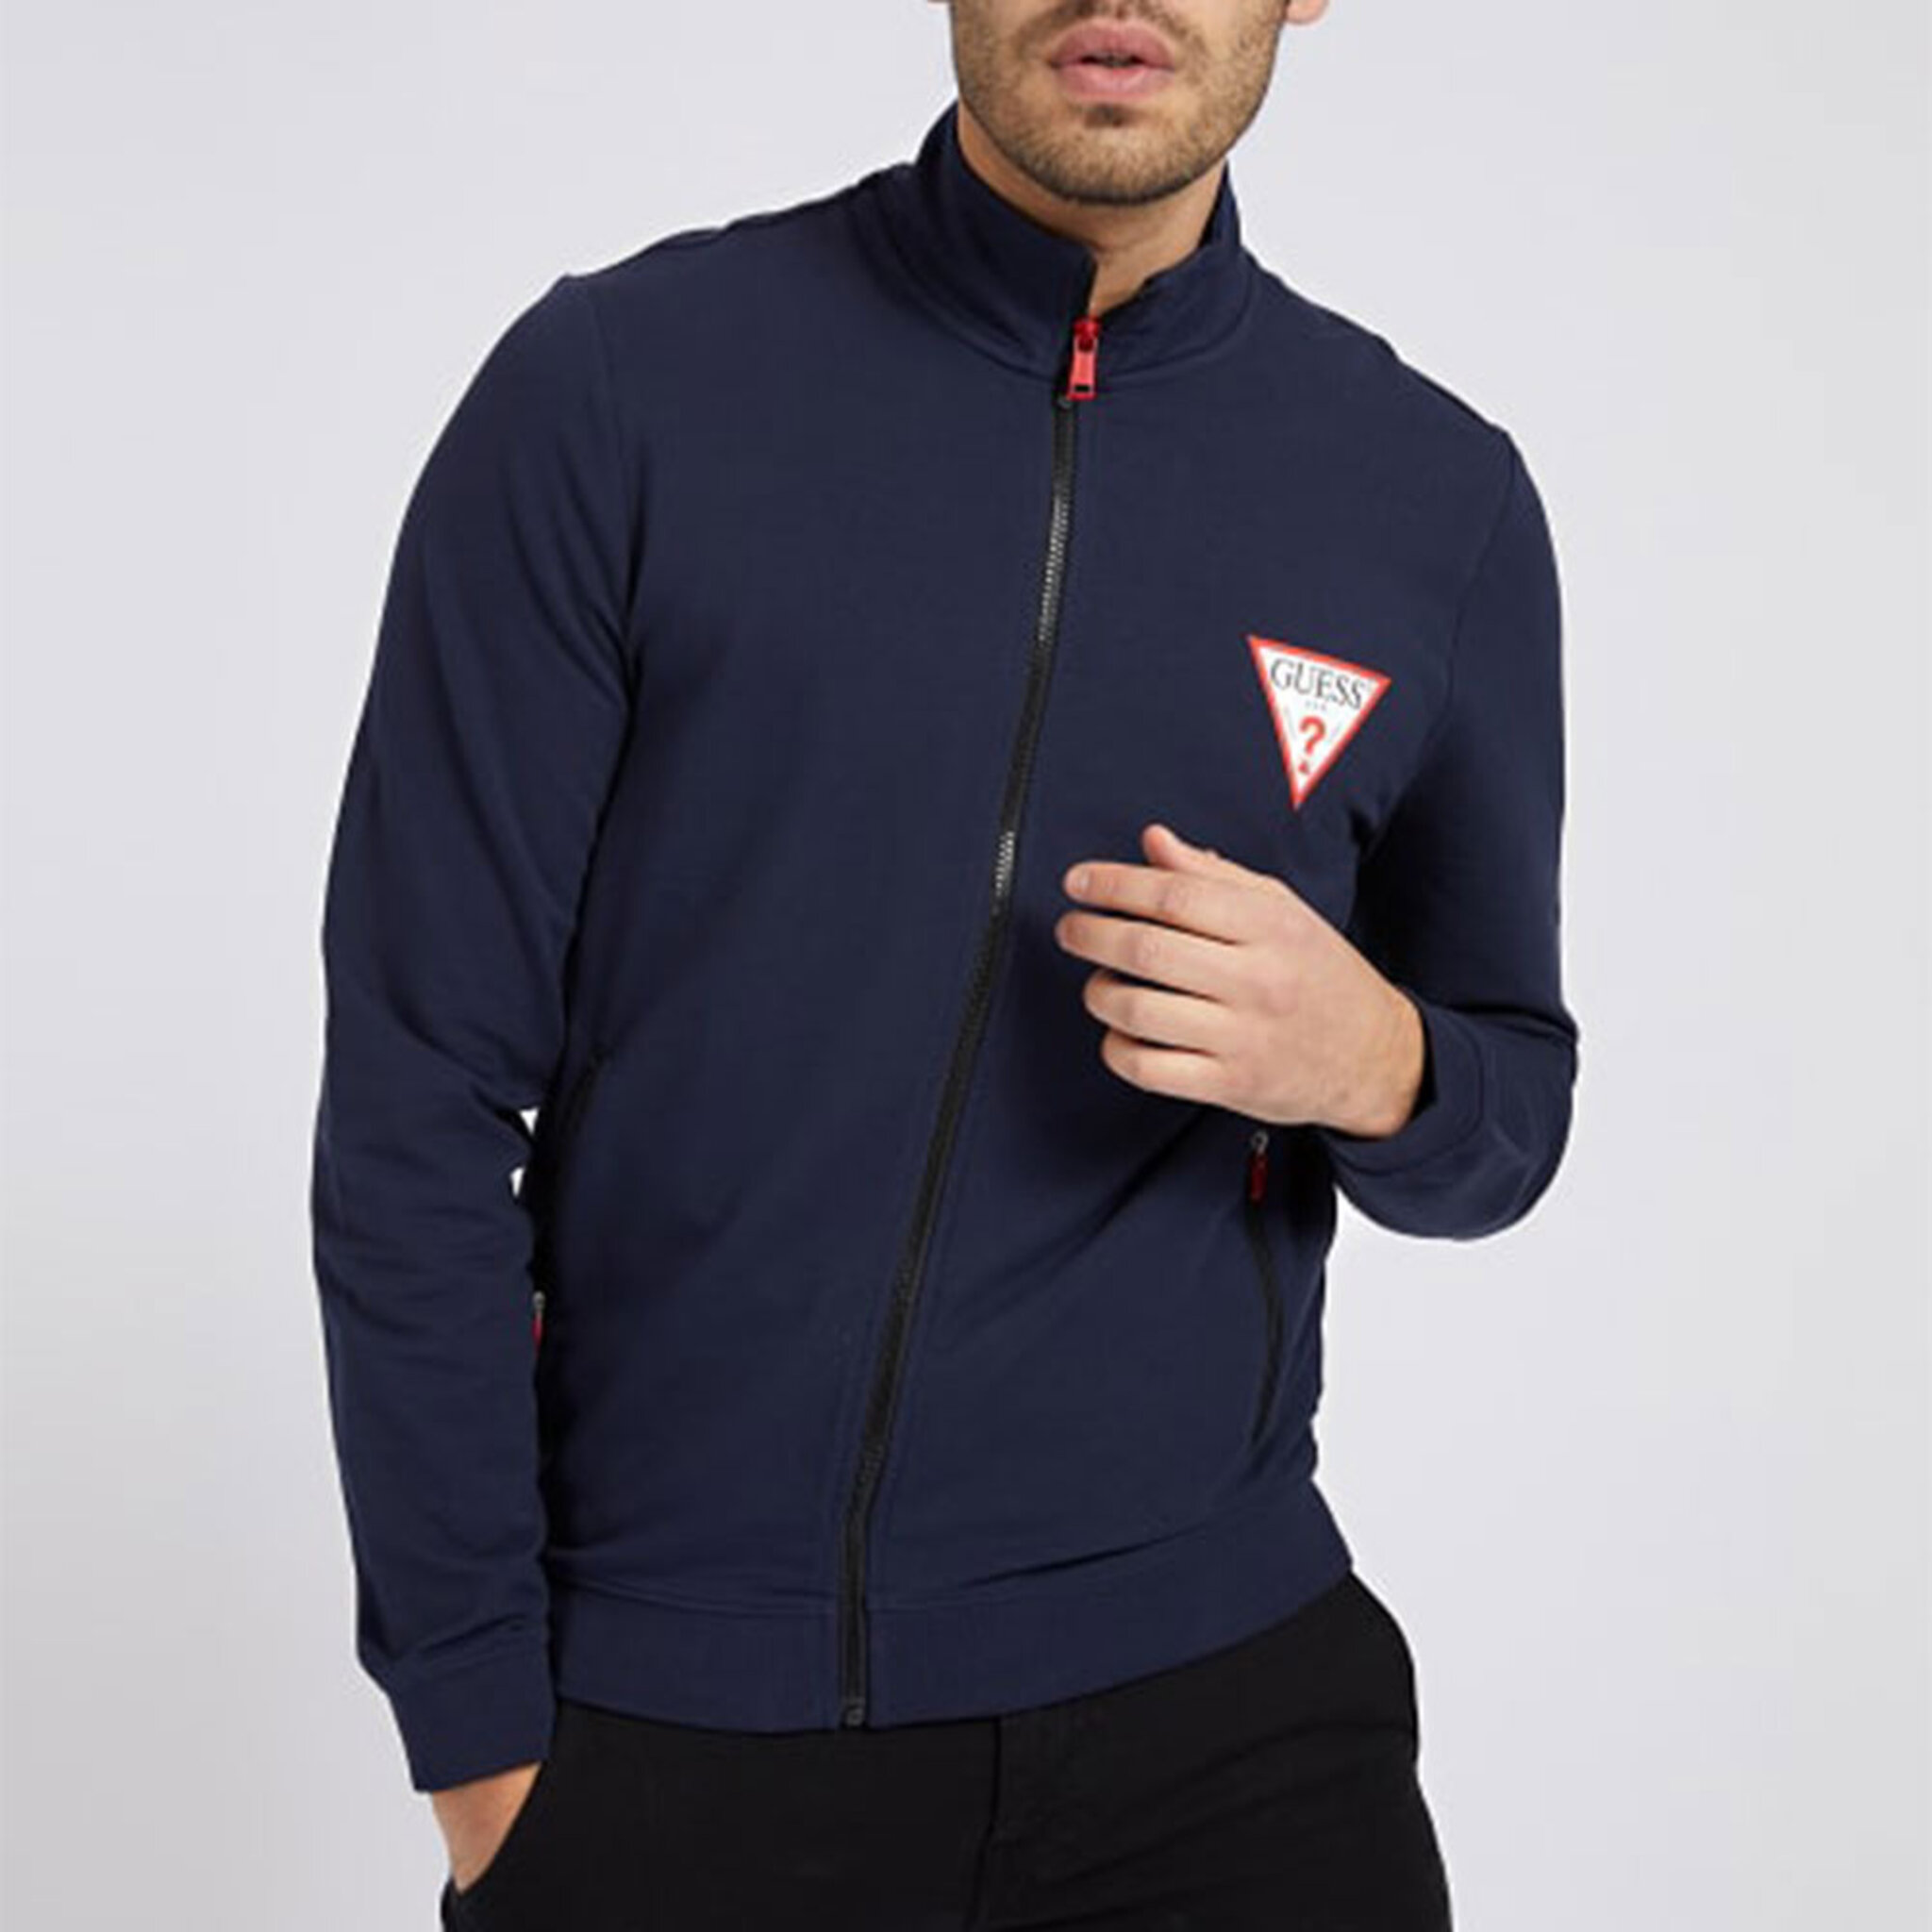 Al Truck Fleece Sweatshirt, XS